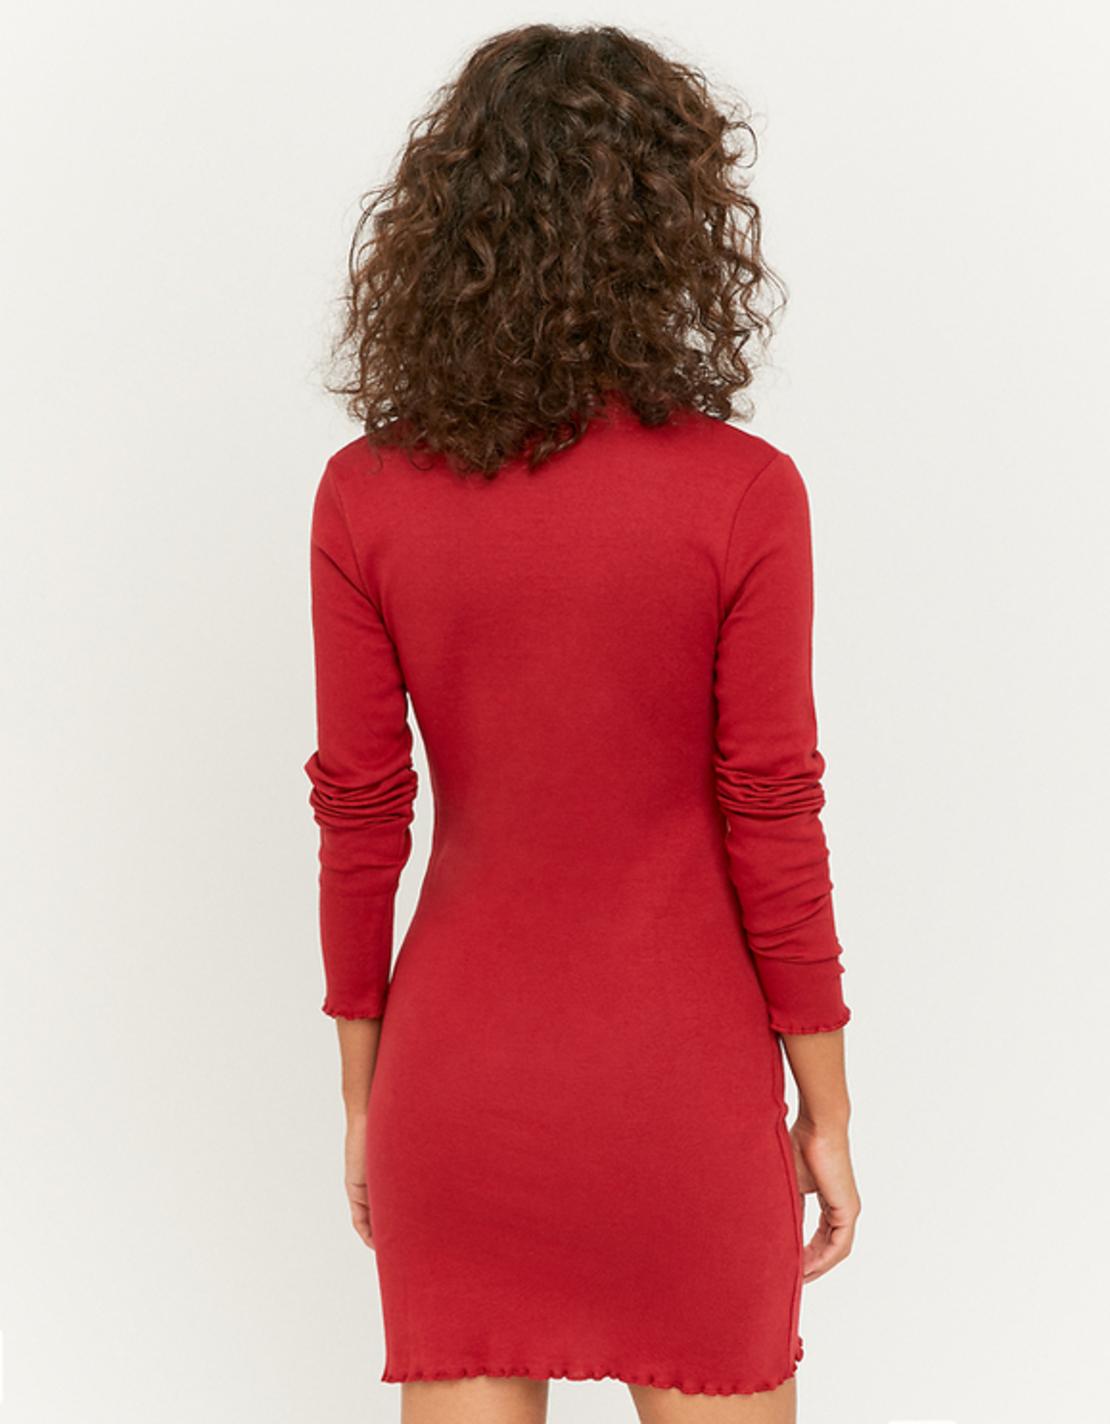 SDRCODRAGON-CBI RED099 שמלה קז'ואל דפוס